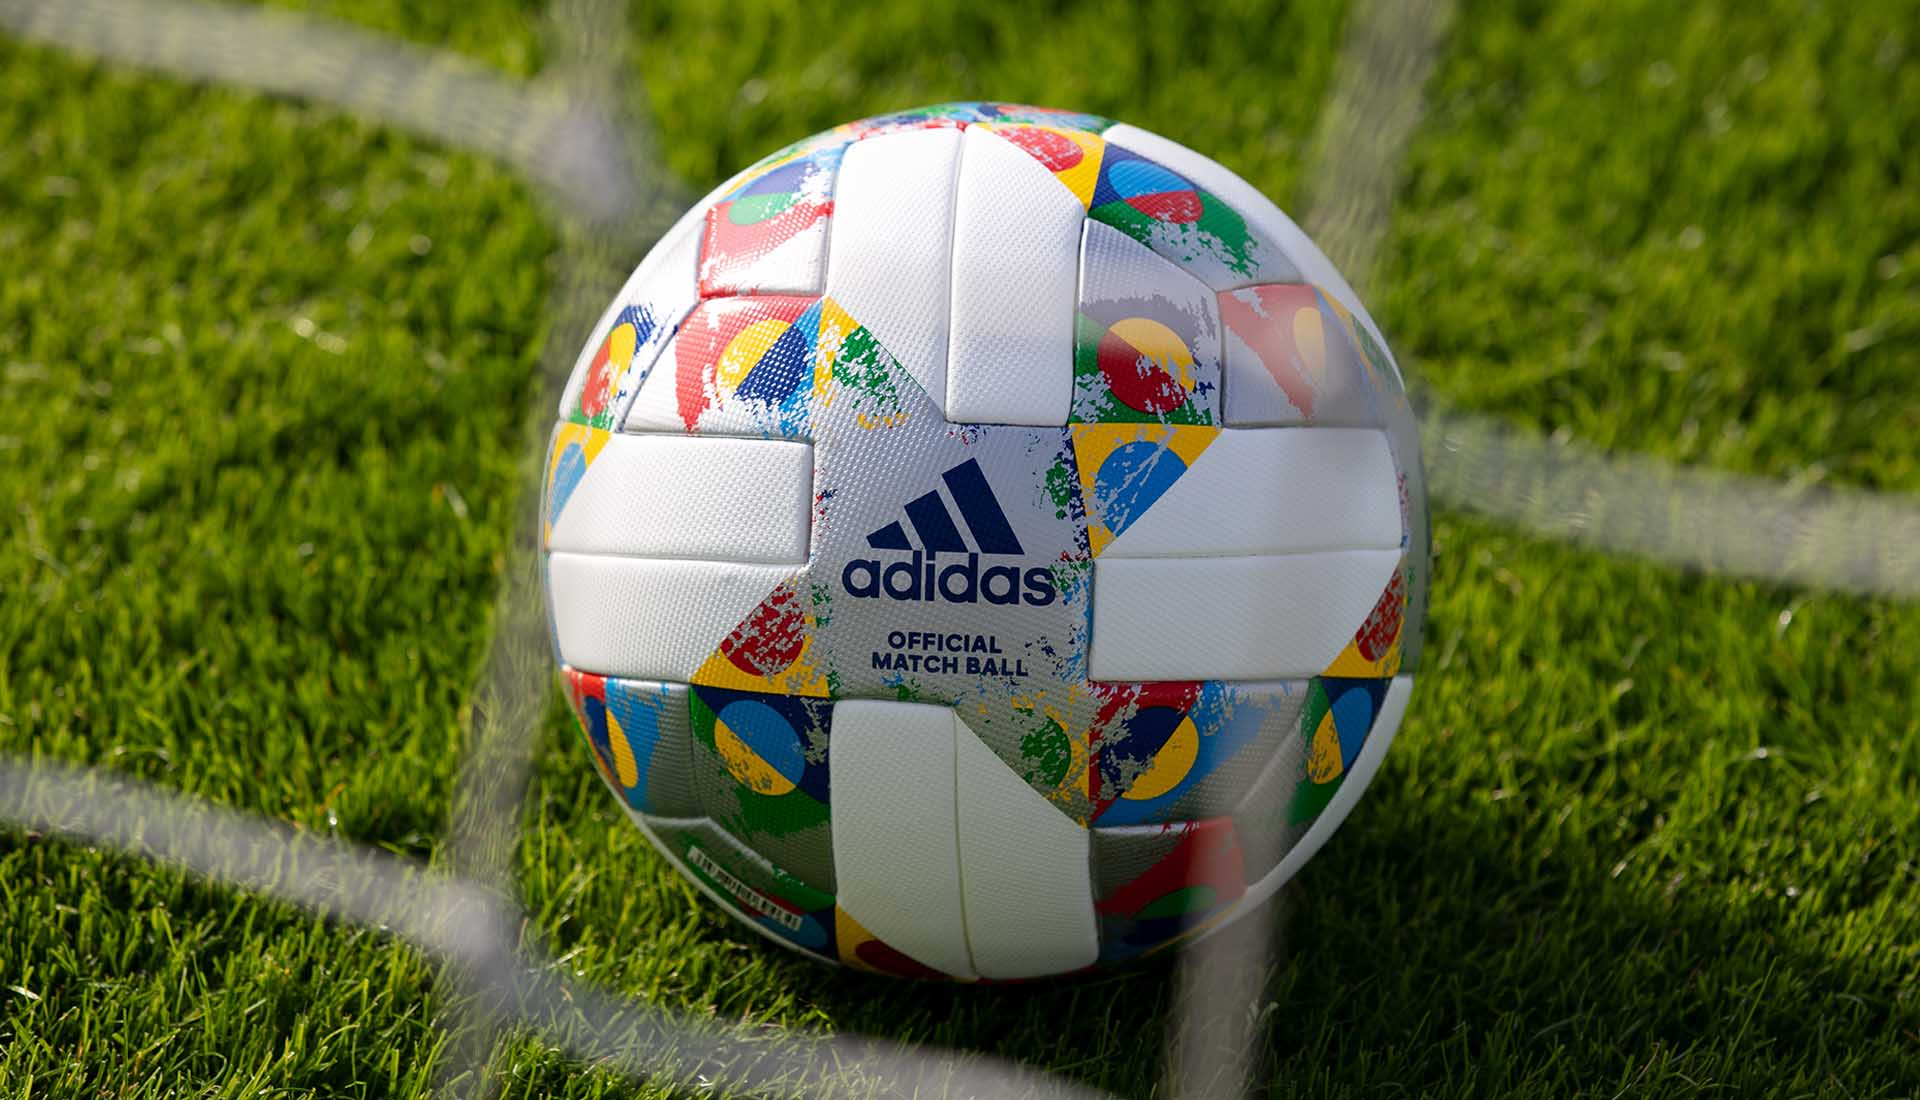 8b029ed8ae adidas Launch The UEFA Nations League Match Ball - SoccerBible